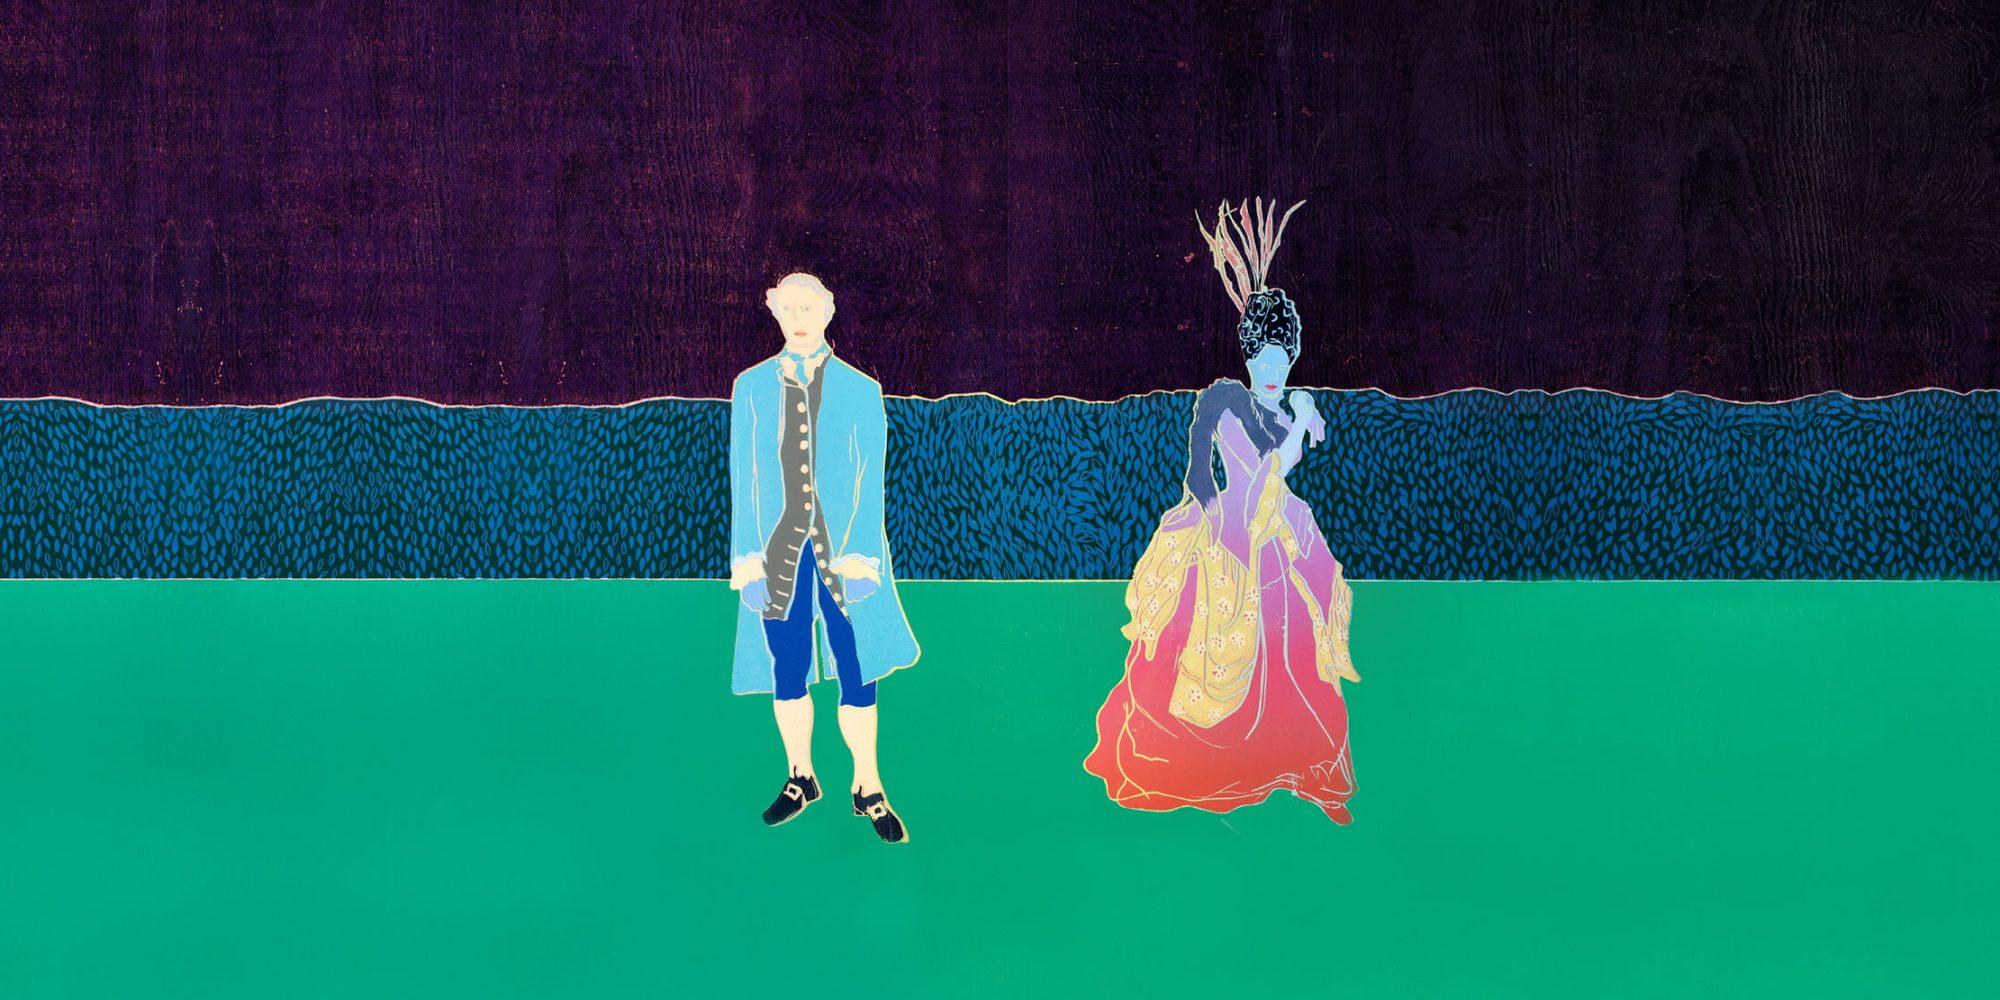 Glyndebourne Presents Donizetti's Don Pasquale